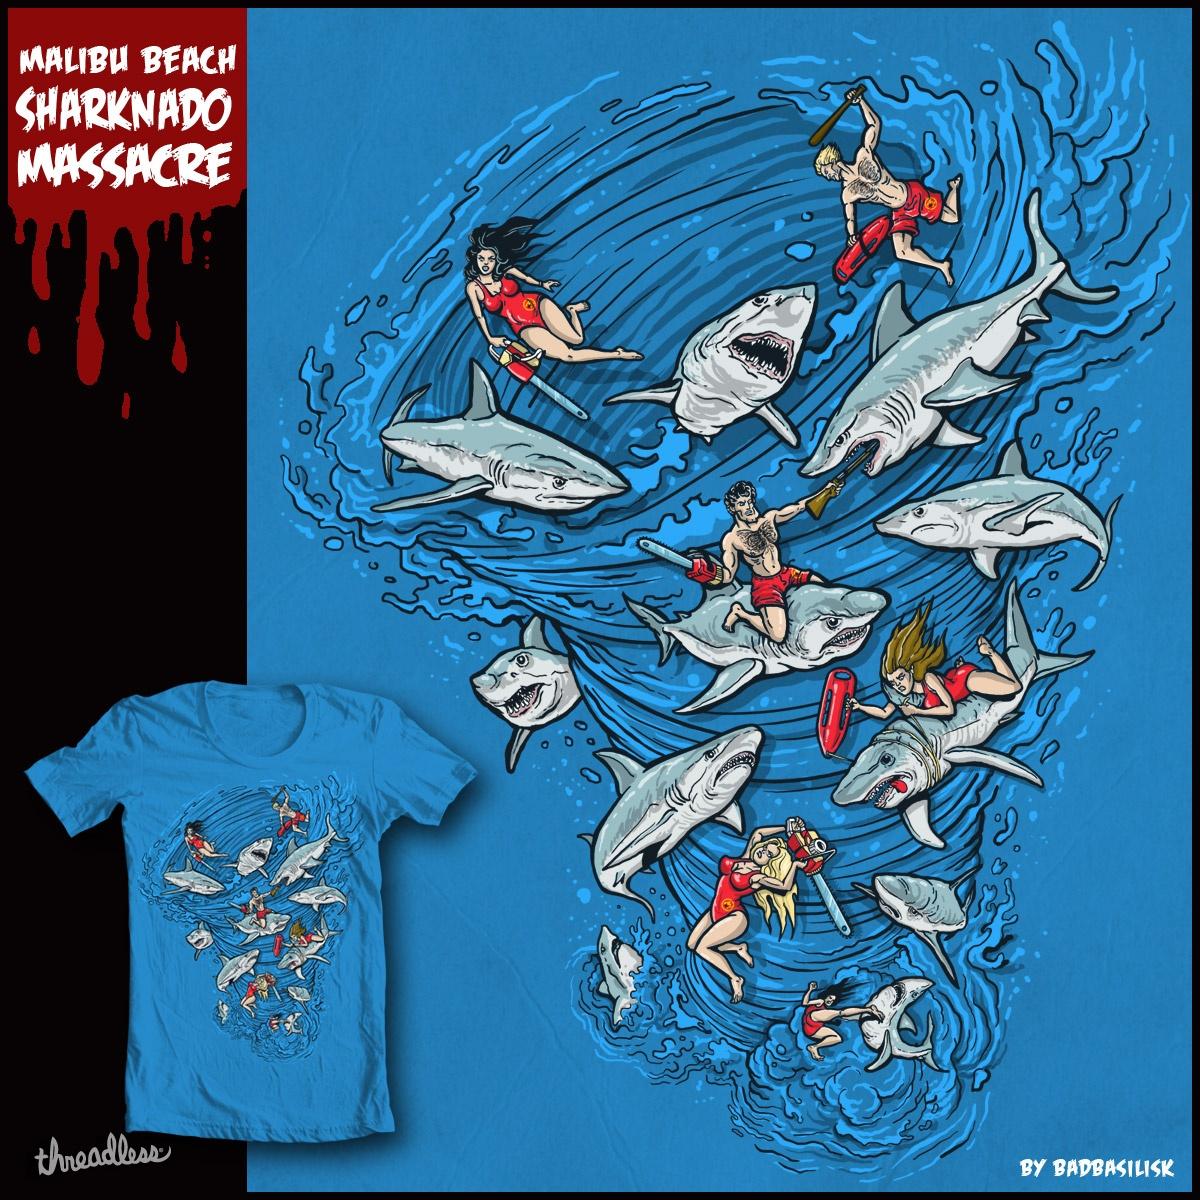 Malibu Beach Sharknado Massacre by badbasilisk on Threadless